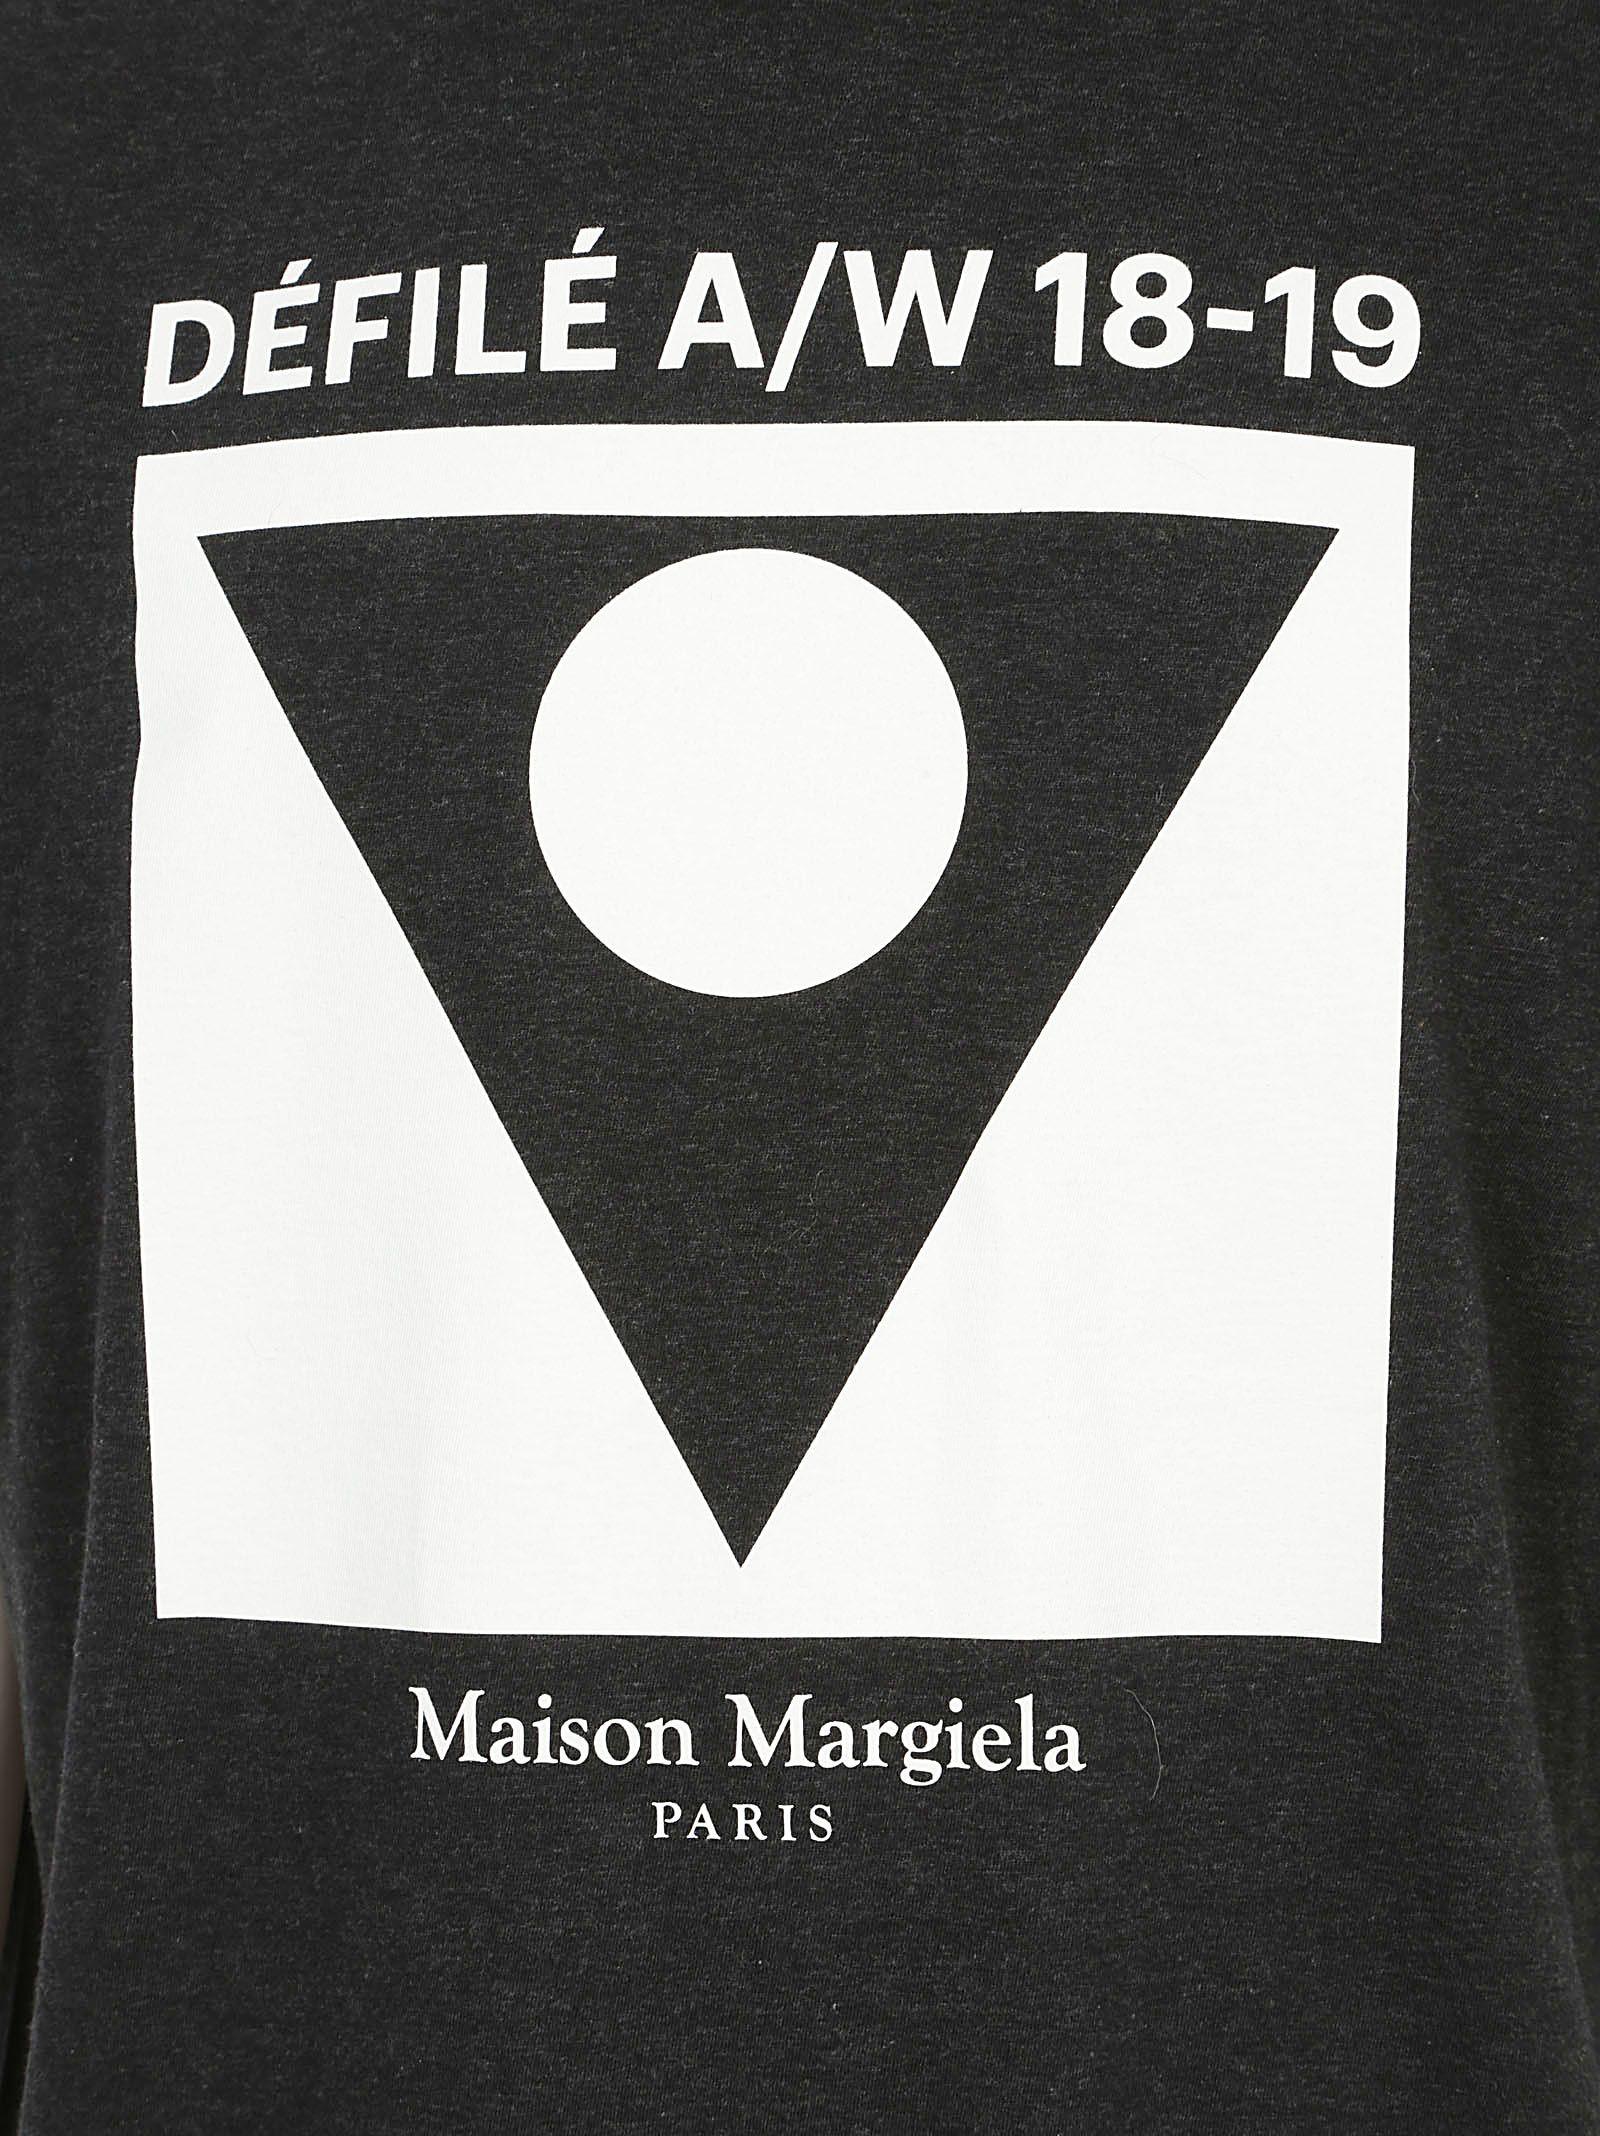 Italist Best Price In The Market For Maison Margiela Maison Martin